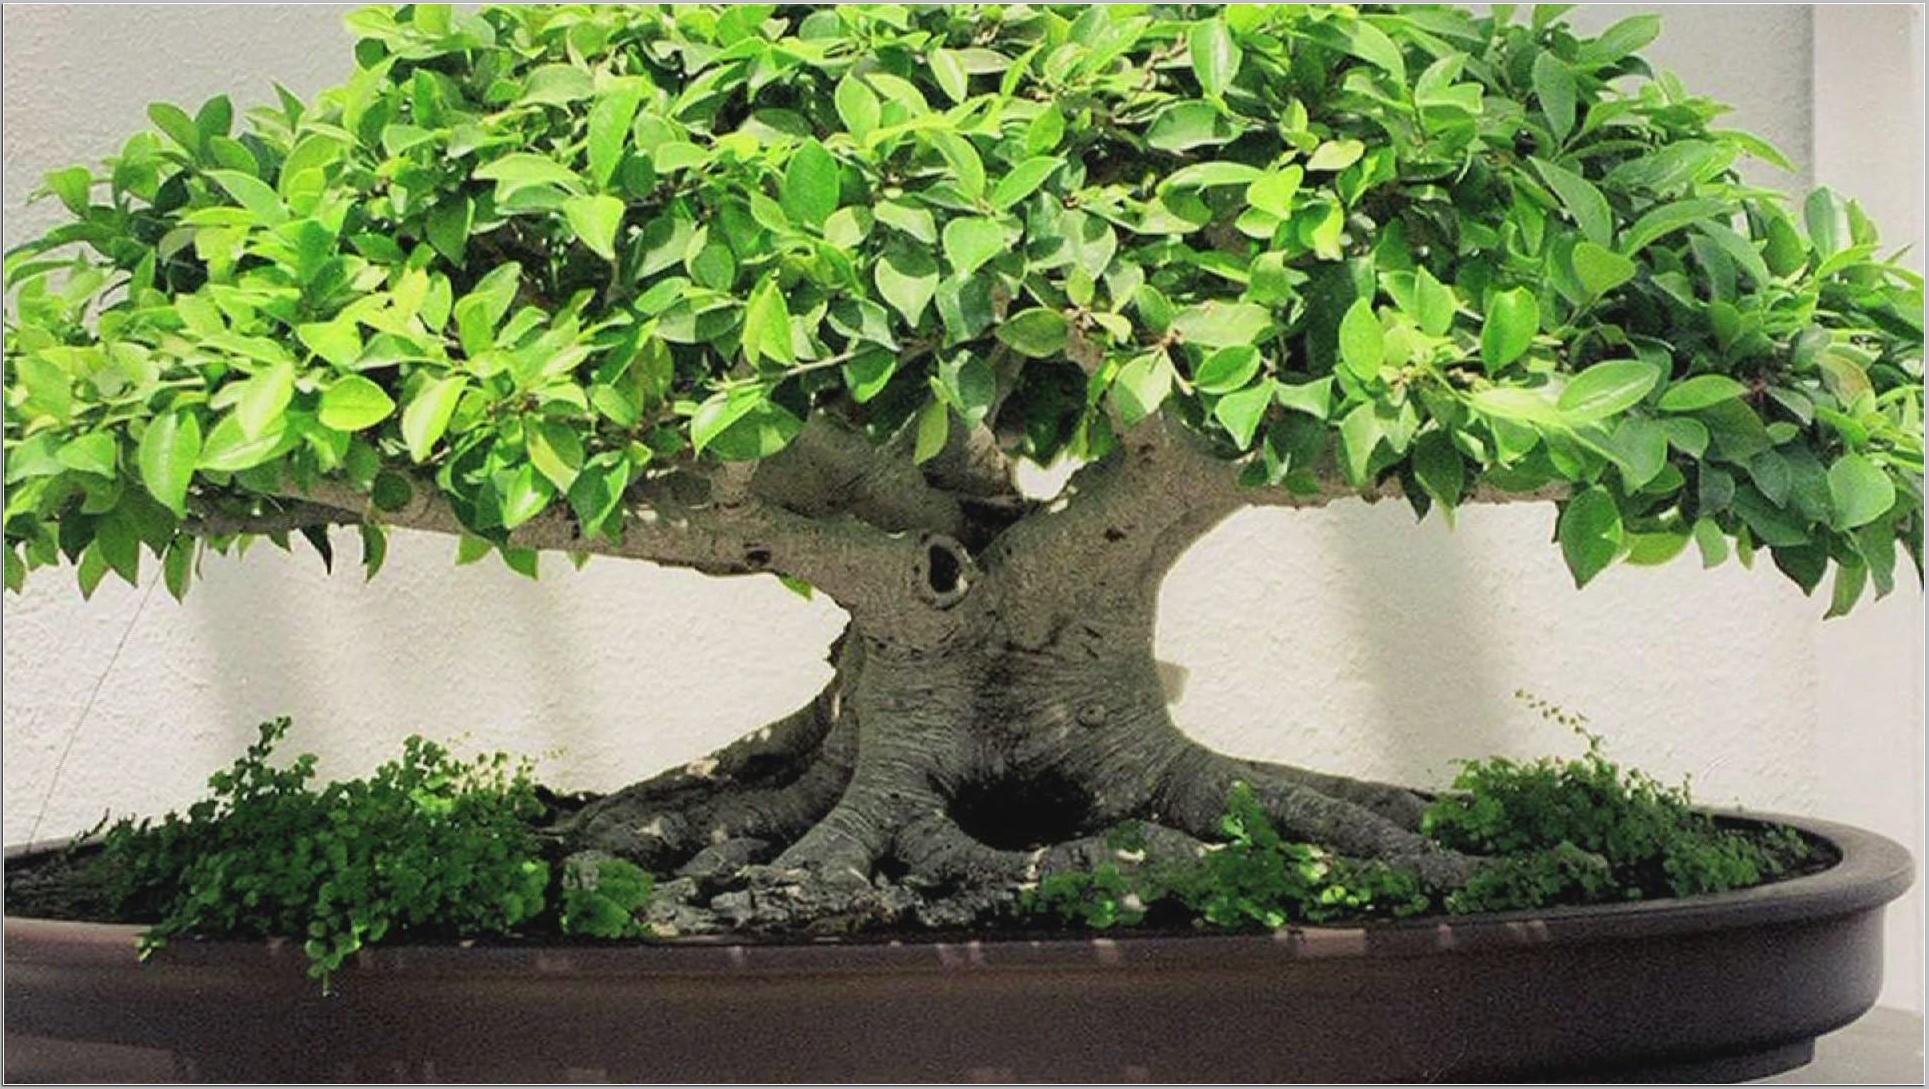 Res: 1929x1089, Bonsai Tree Wallpaper Ornamental For Home